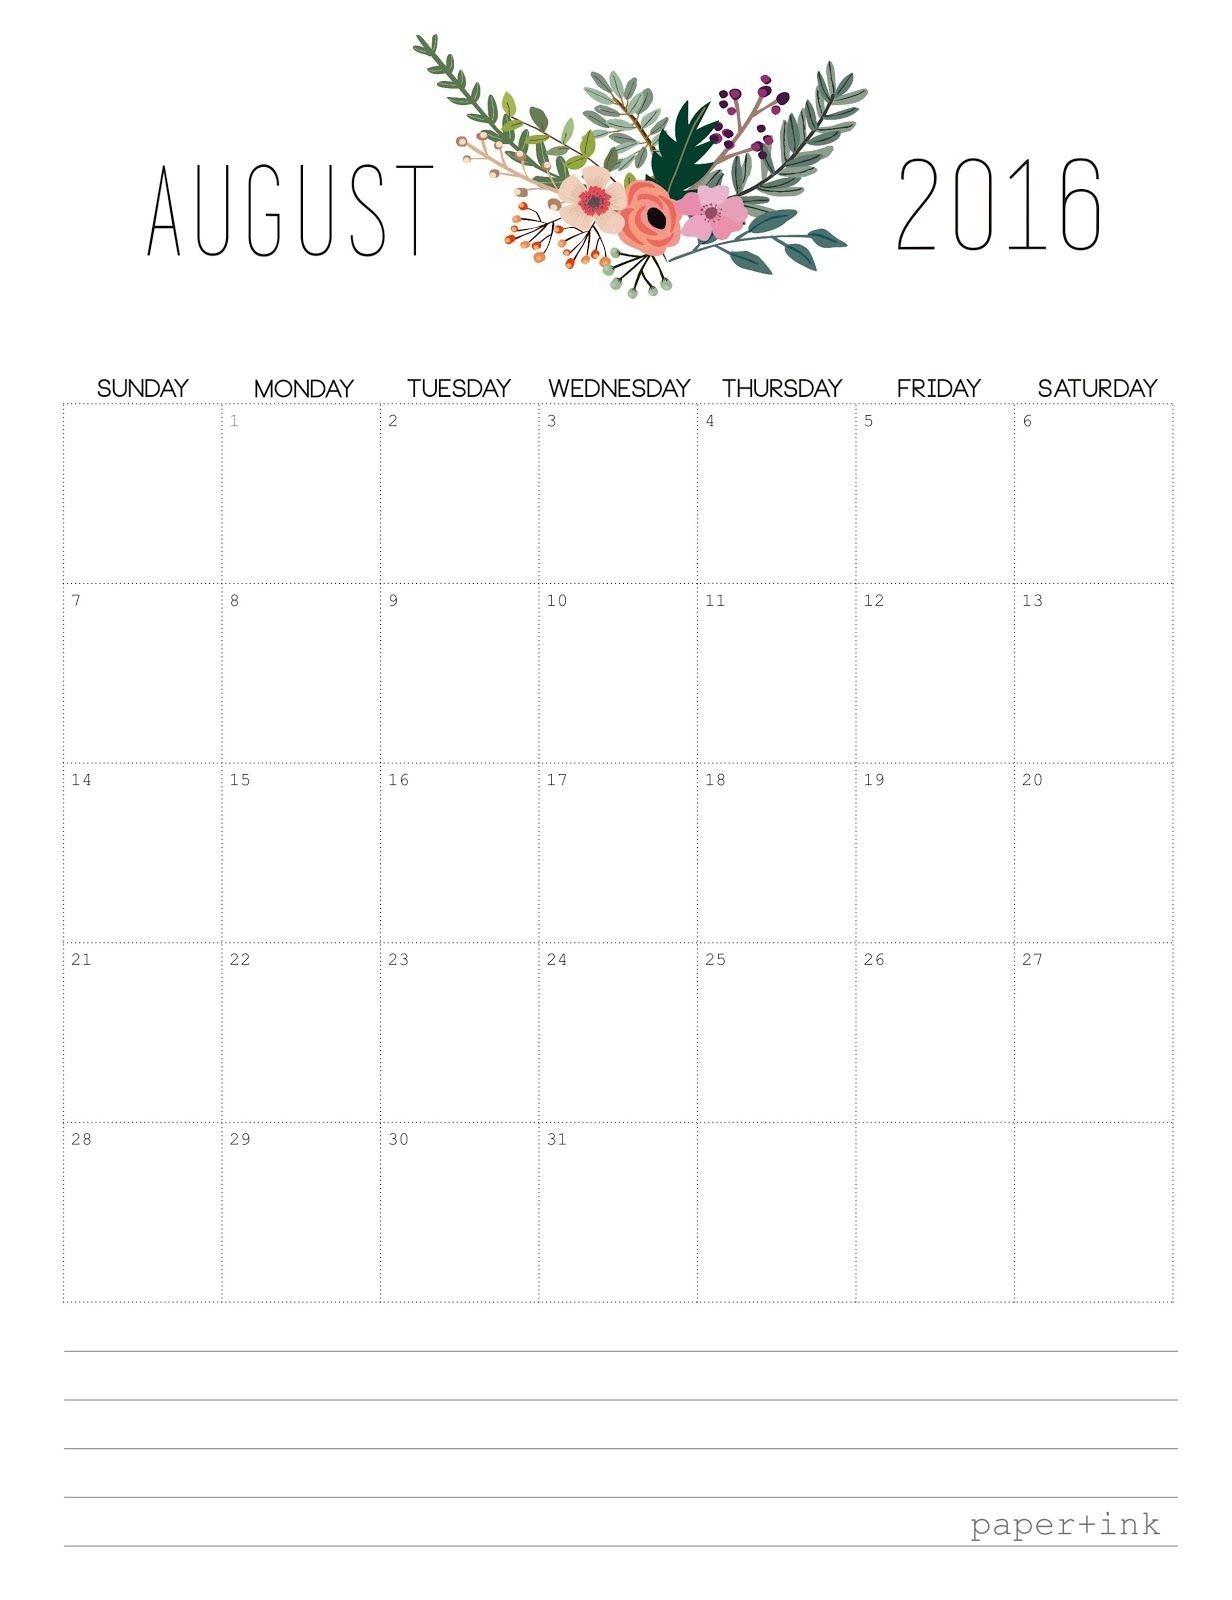 Pretty Unpretentious: Free Printable : August 2016 Calendar  Pretty Monthly Calendar